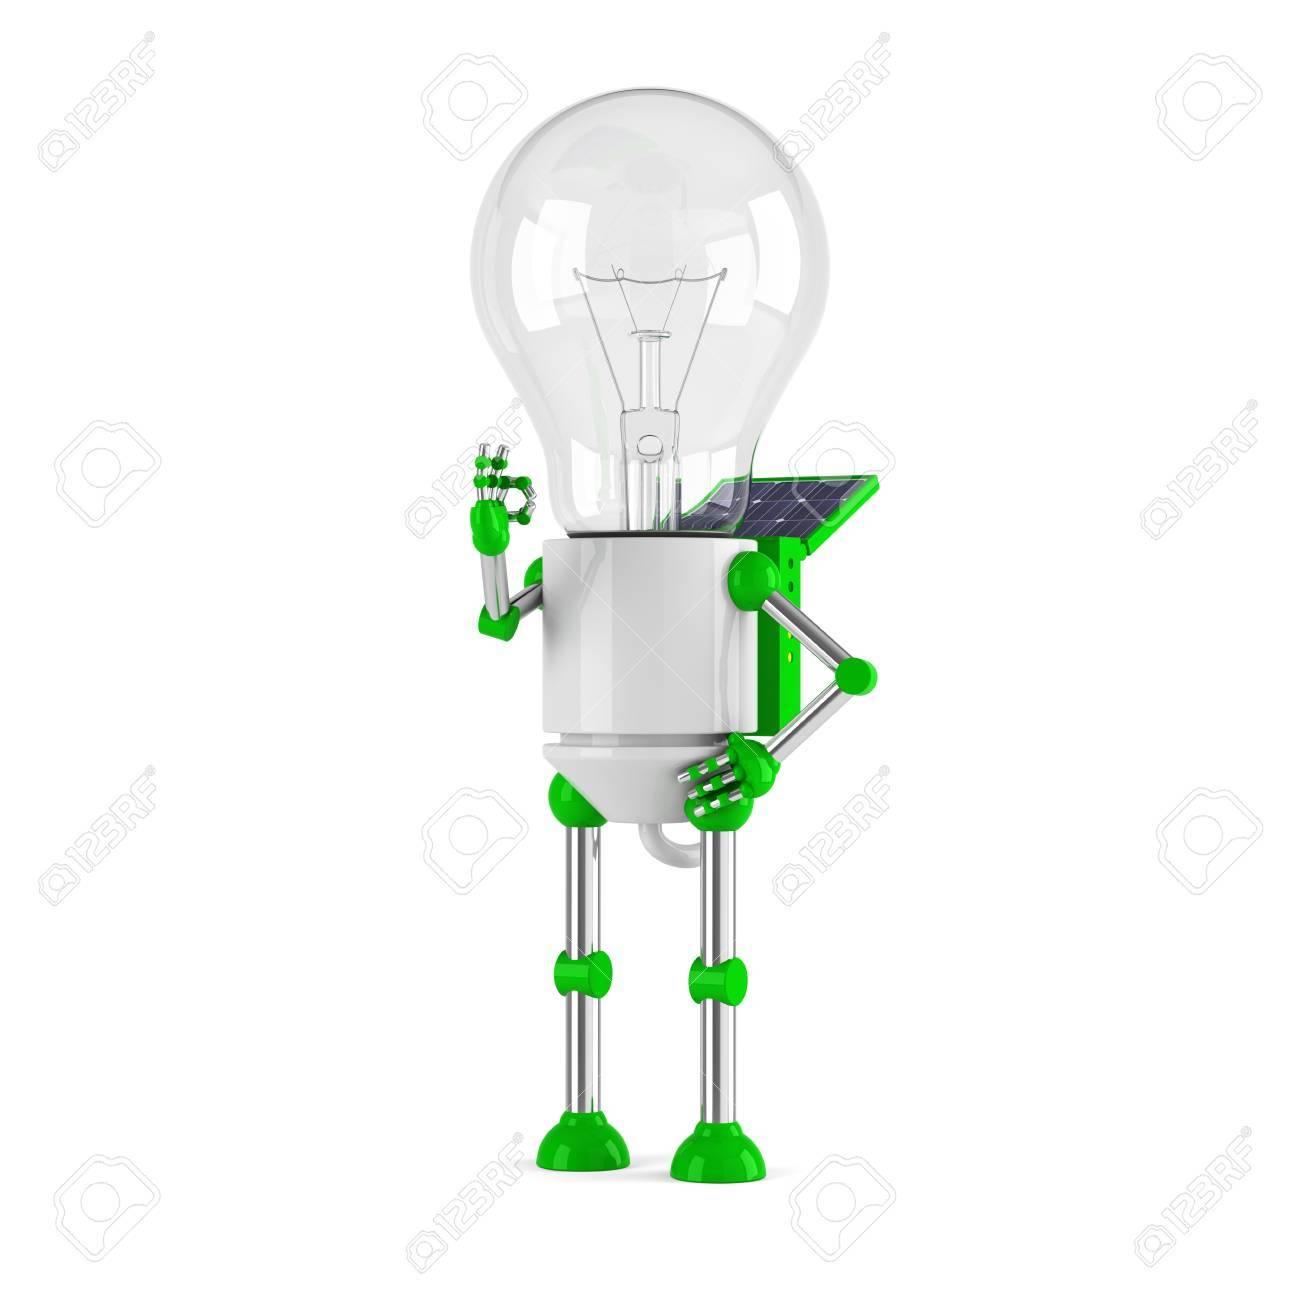 solar powered light bulb robot - ok Stock Photo - 10117707